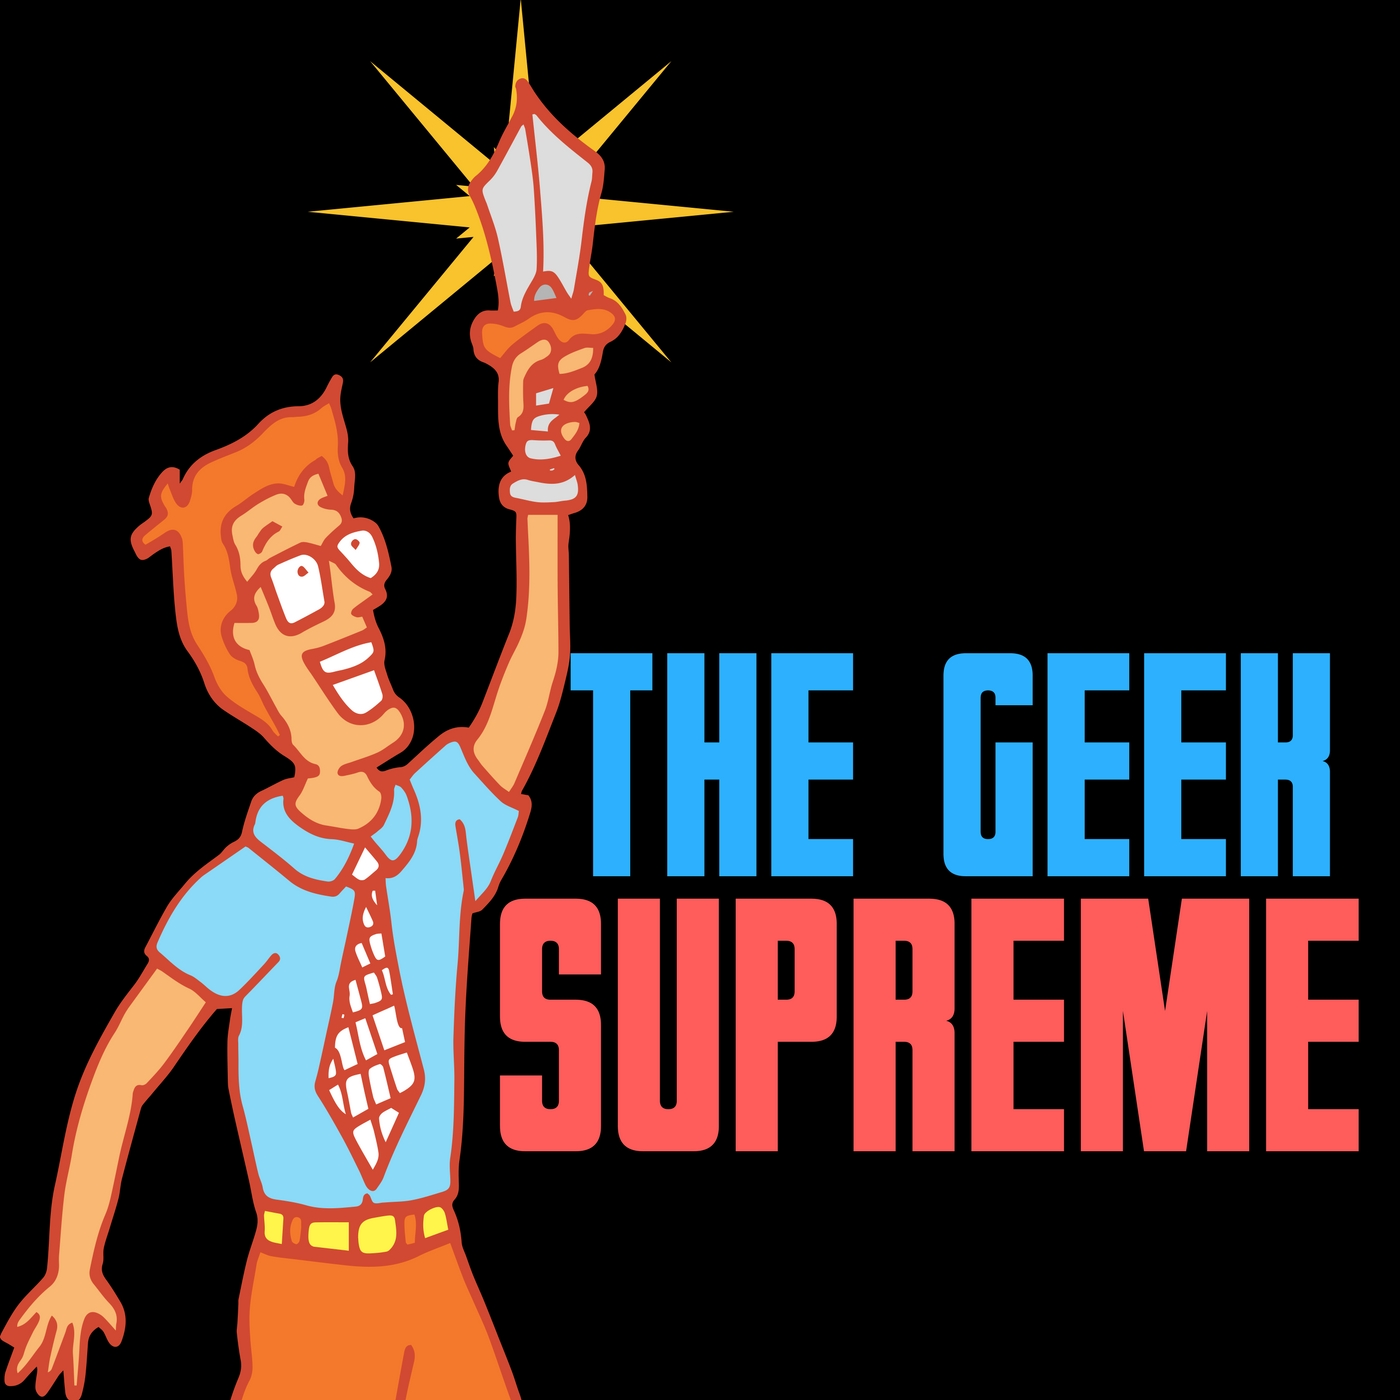 The Geek Supreme